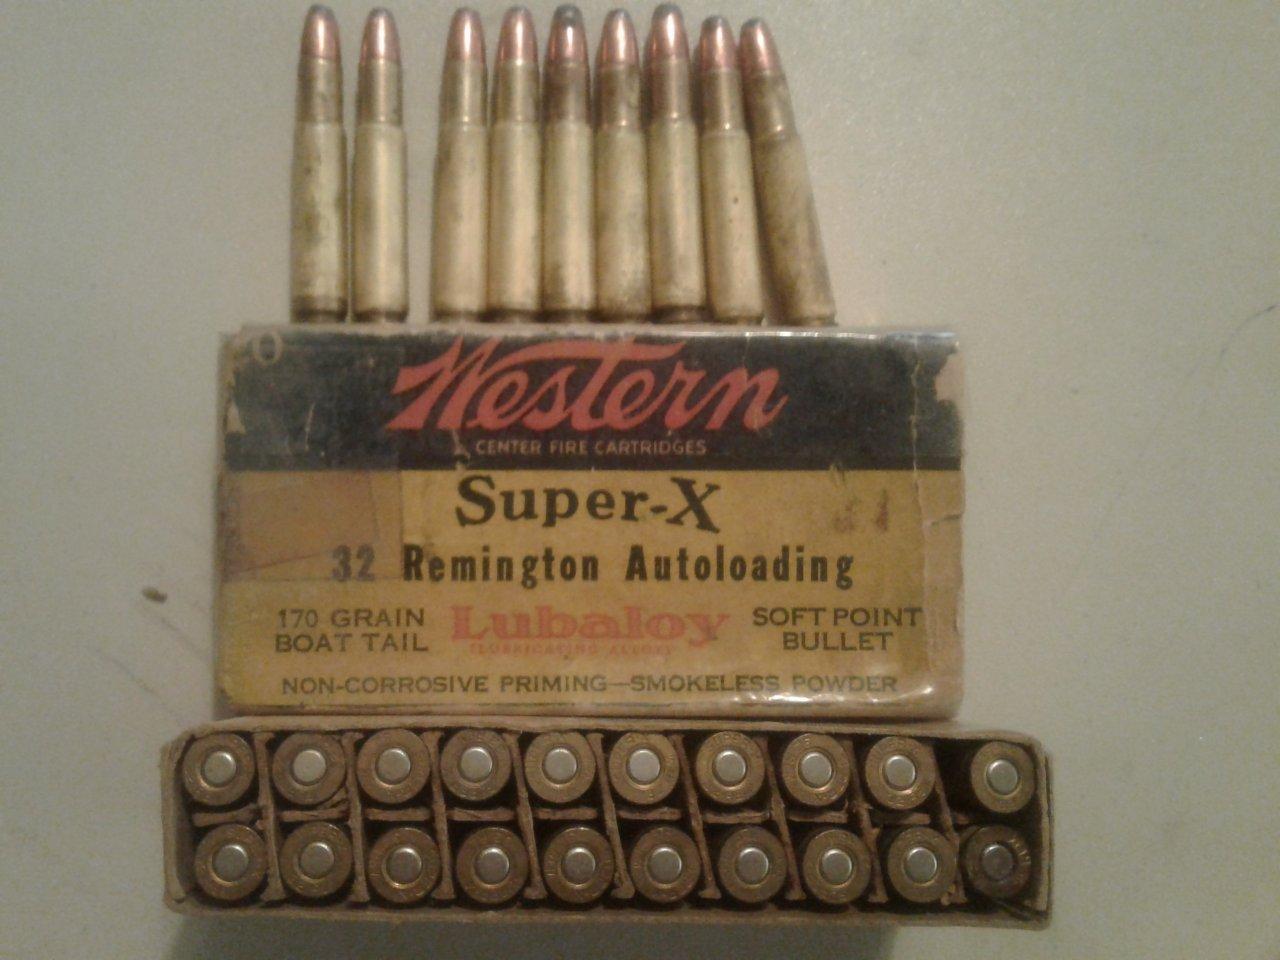 29 Rounds Of Remington 32 Auto Loader | Gun Values Board